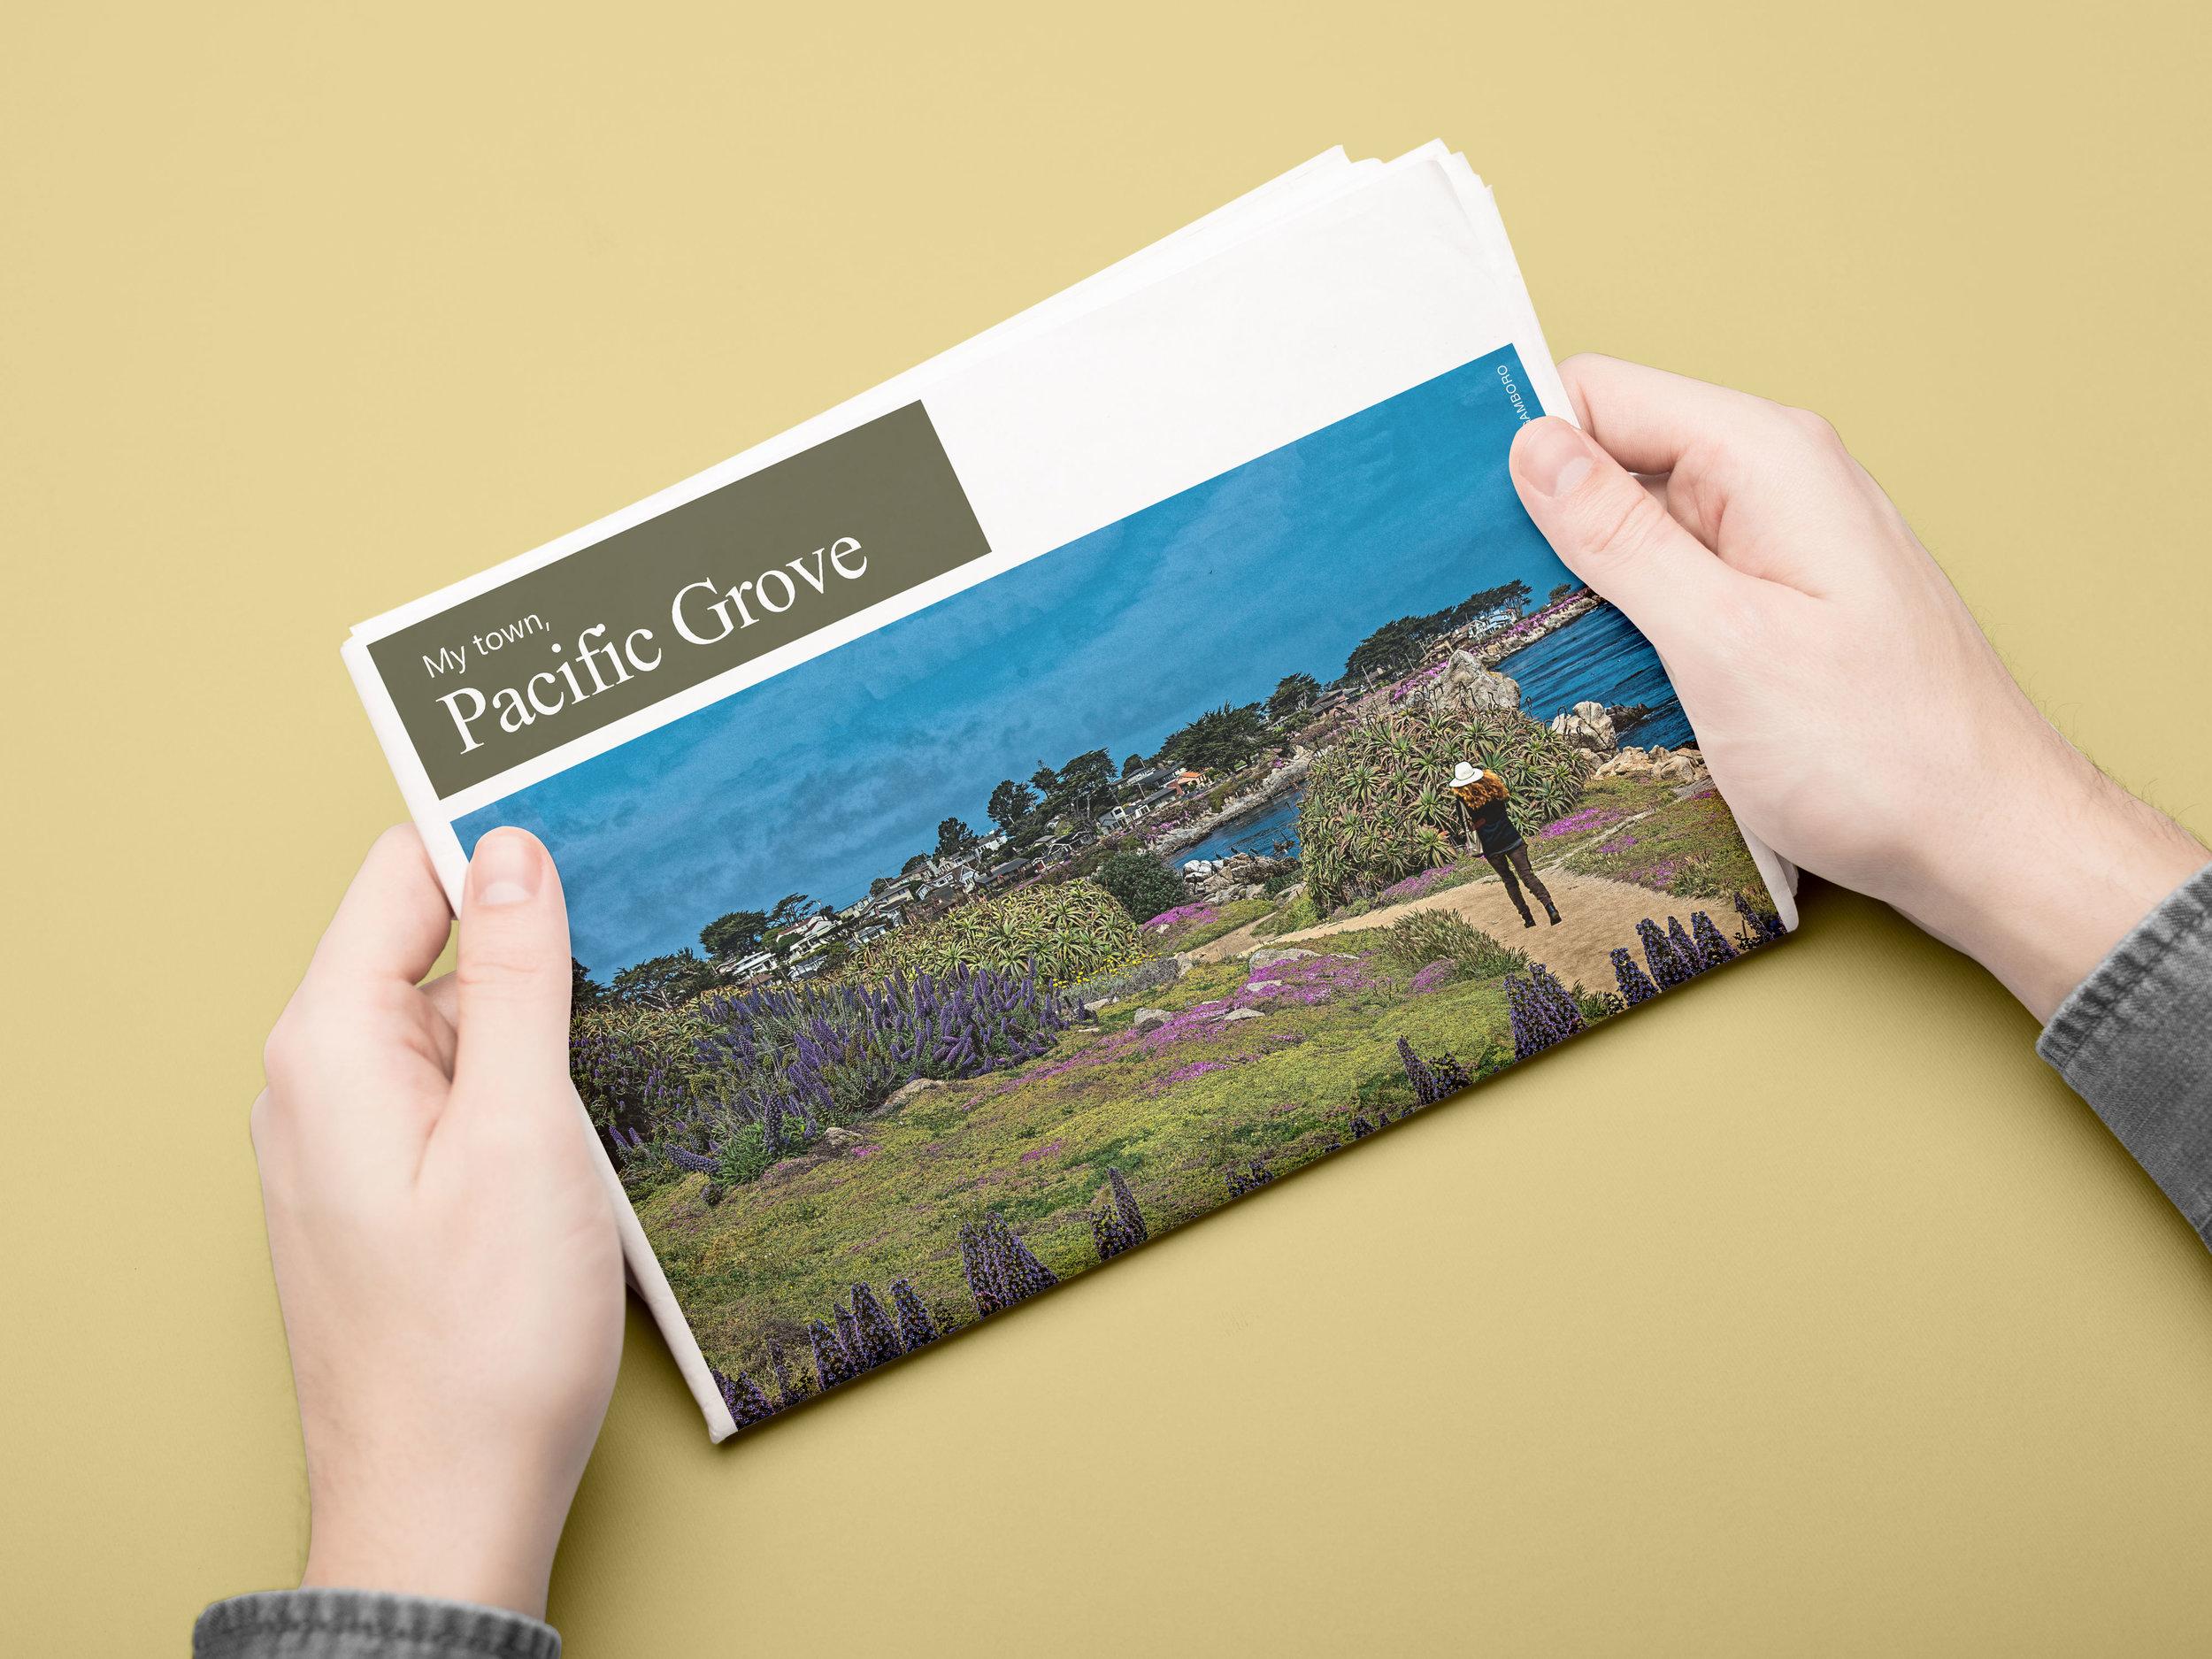 Pacific Grove Spotlight #1